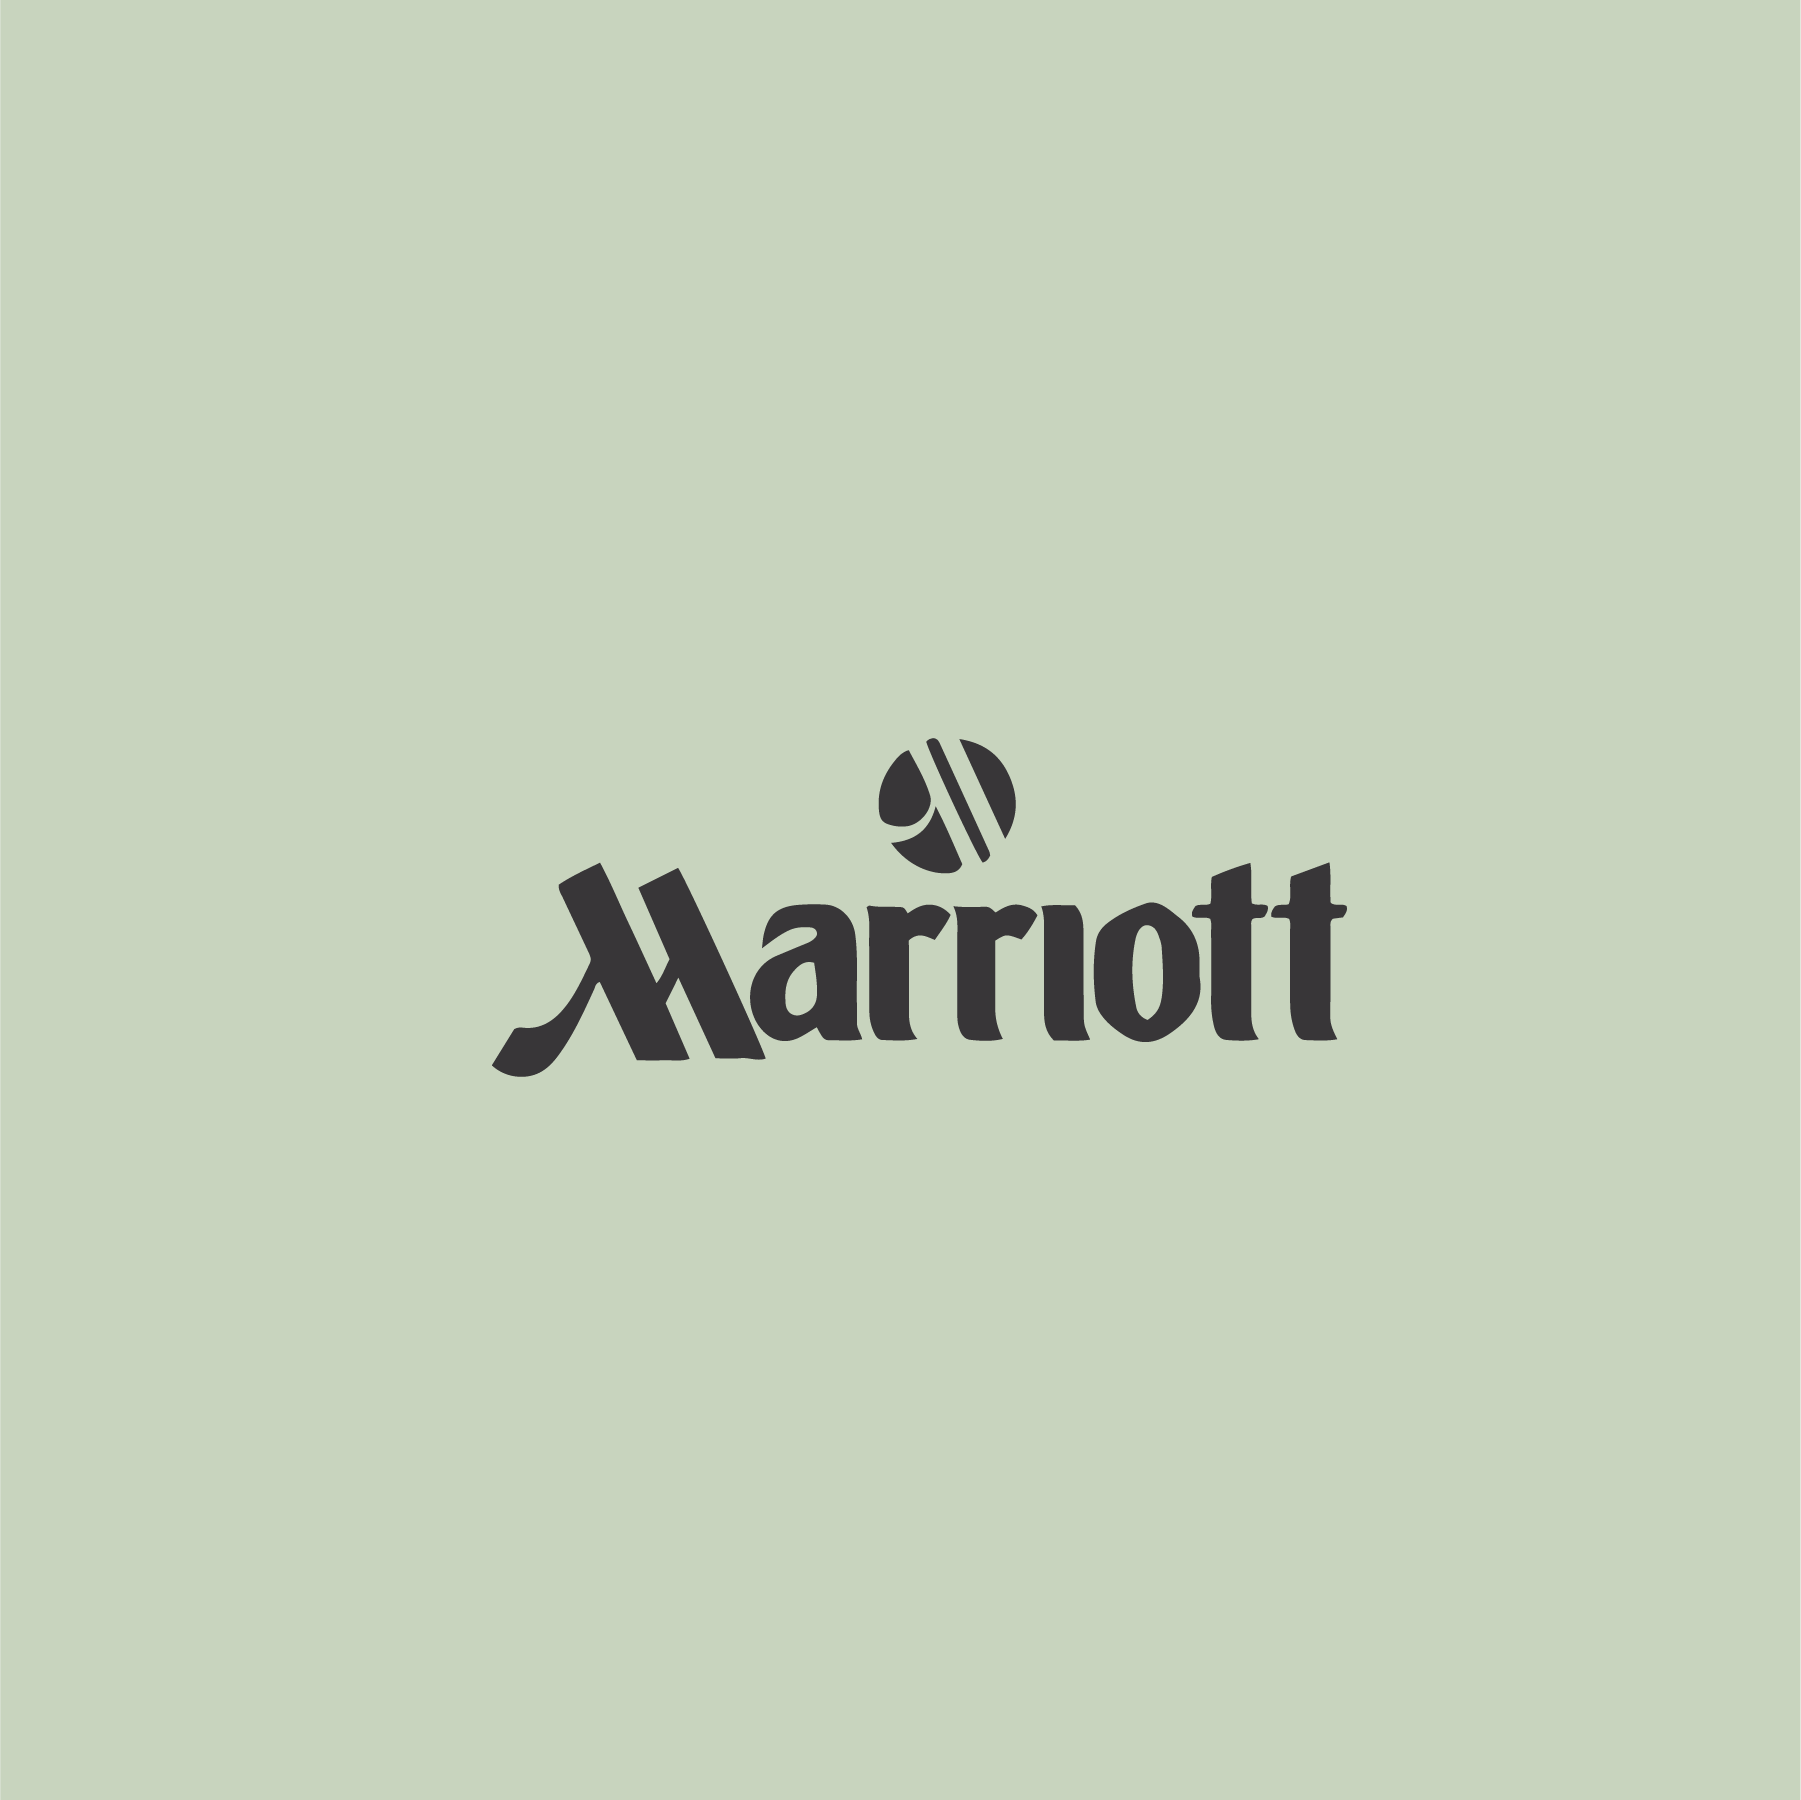 Denver Marriott Westminster Site Relaunch - Client: Marriott for Screen PilotRole: Words| digital |